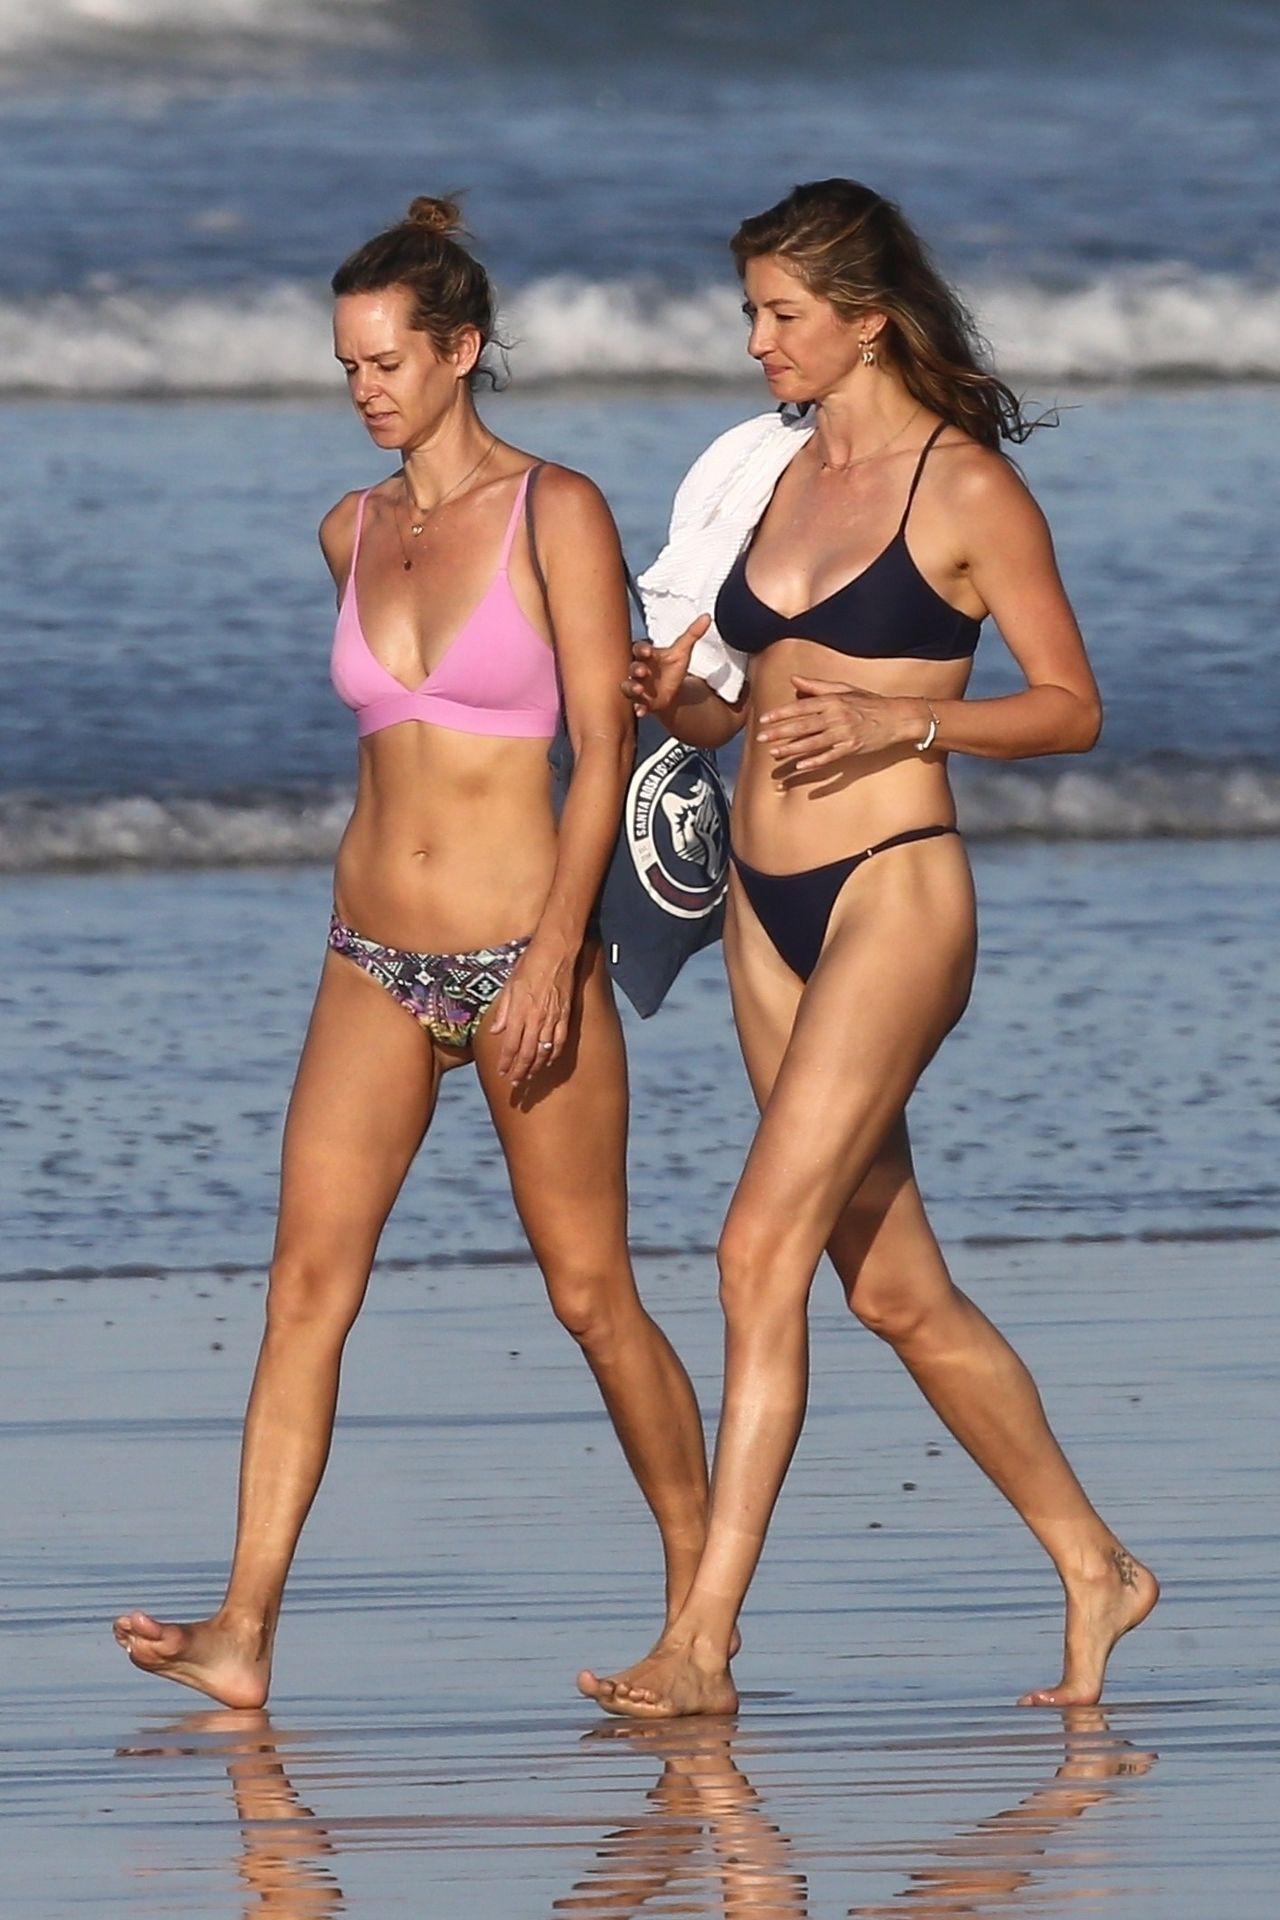 Tom Brady & Gisele Bundchen Pack On The Pda At The Beach 0019